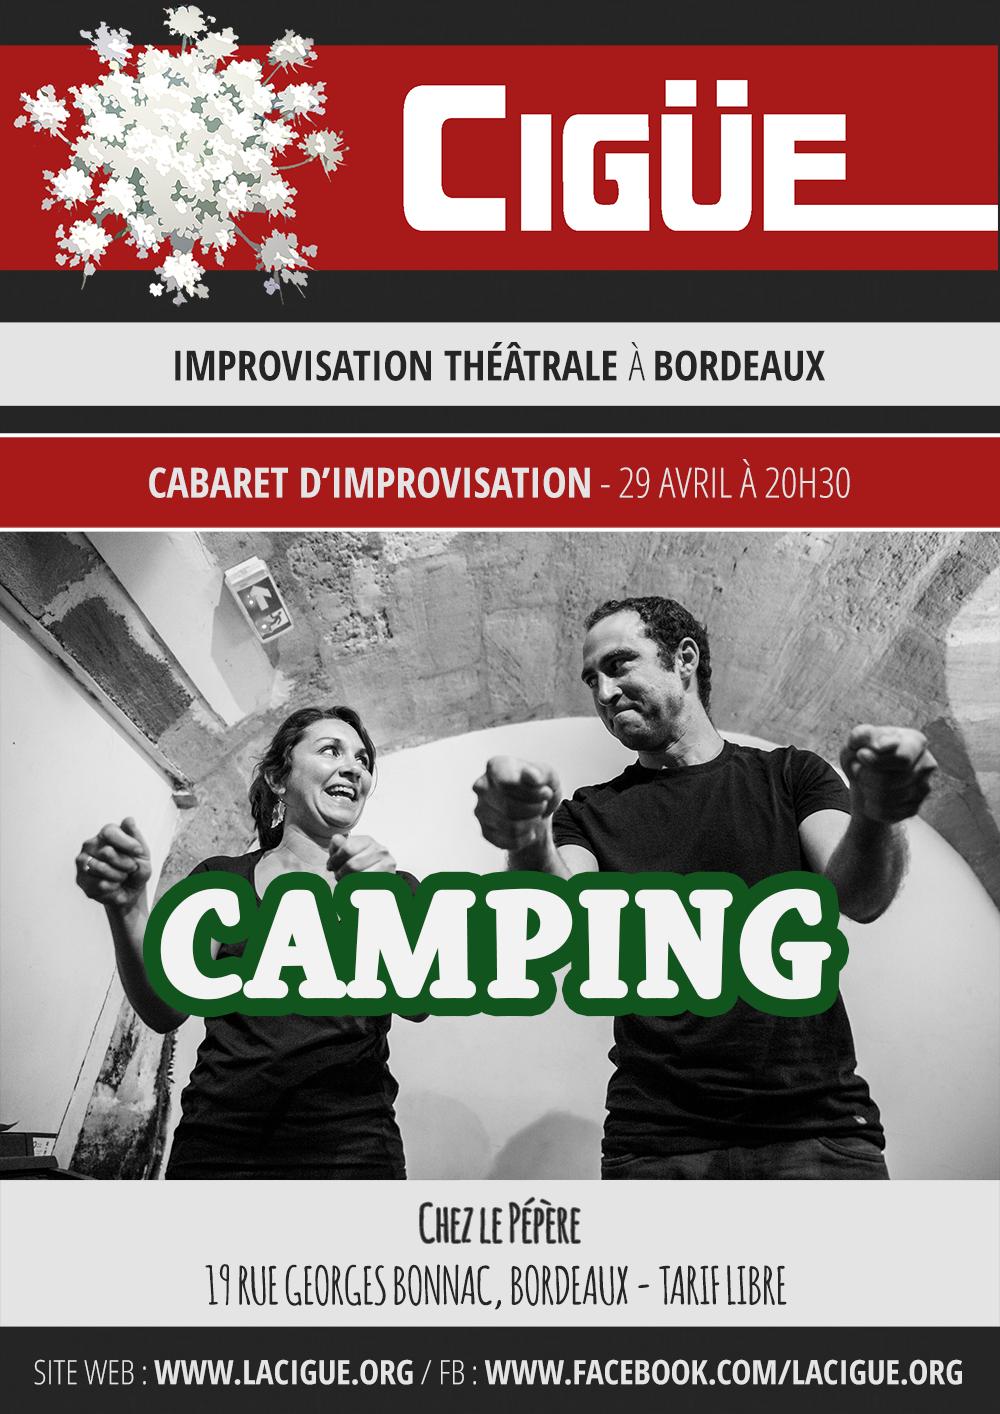 Cabaret Camping